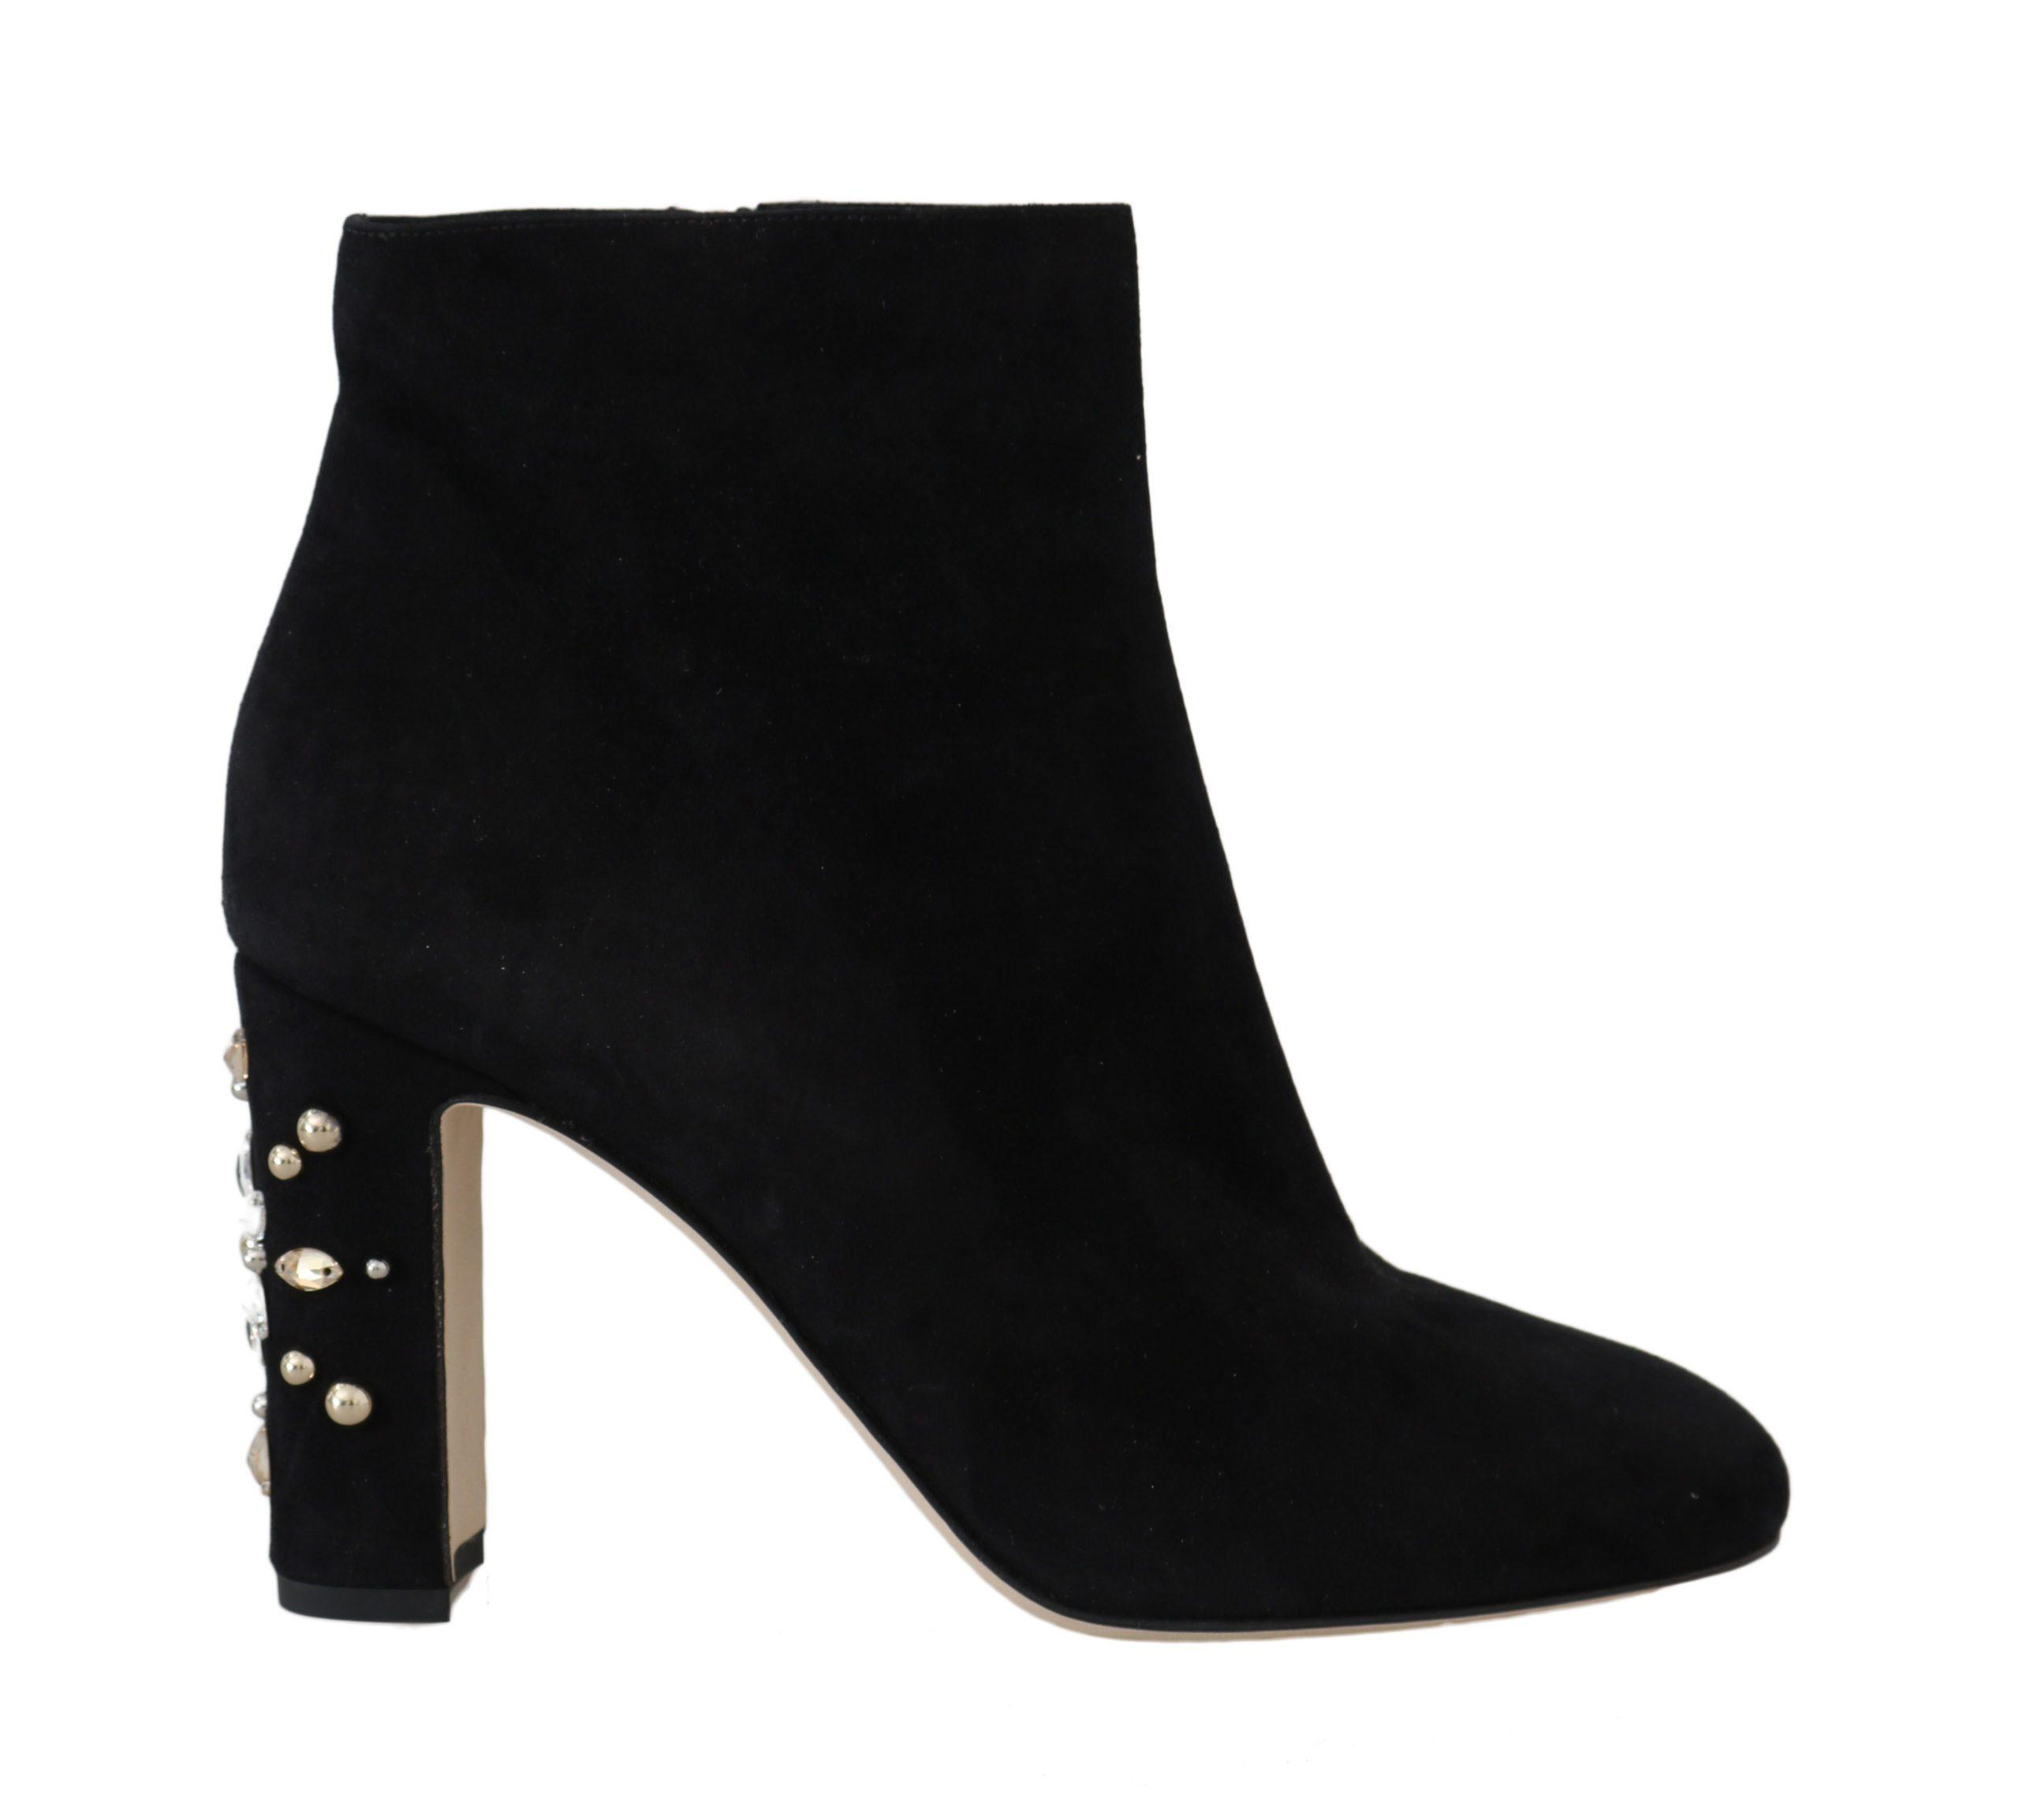 Dolce & Gabbana Women's Suede Crystal Studded Boot Black LA5594 - EU40/US9.5